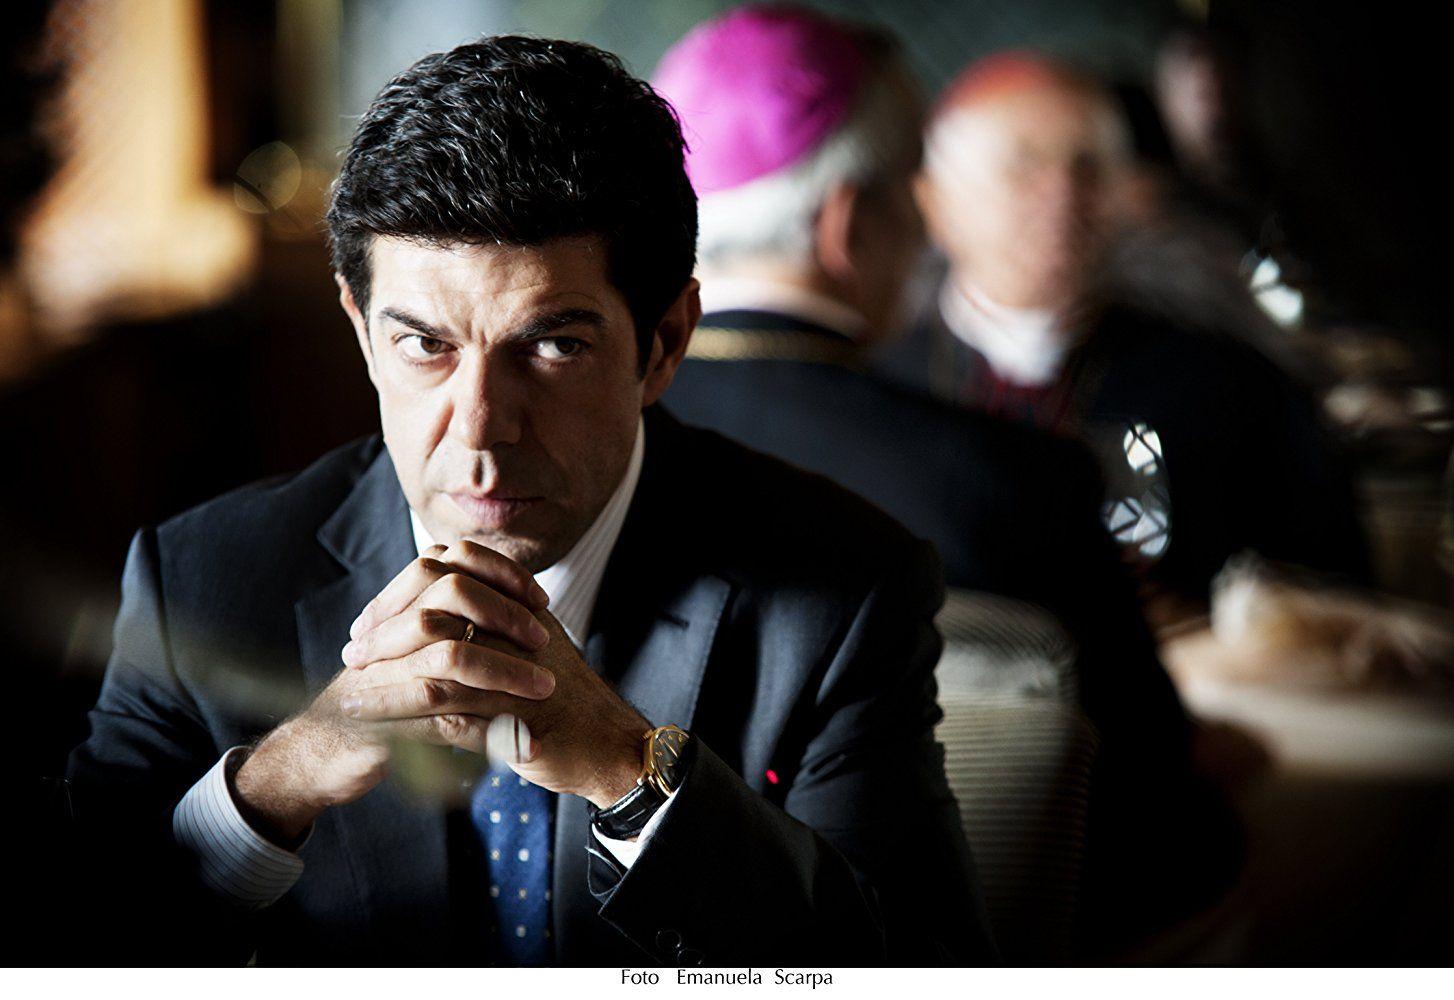 Pierfrancesco Favino in Suburra (2015) Programma tv